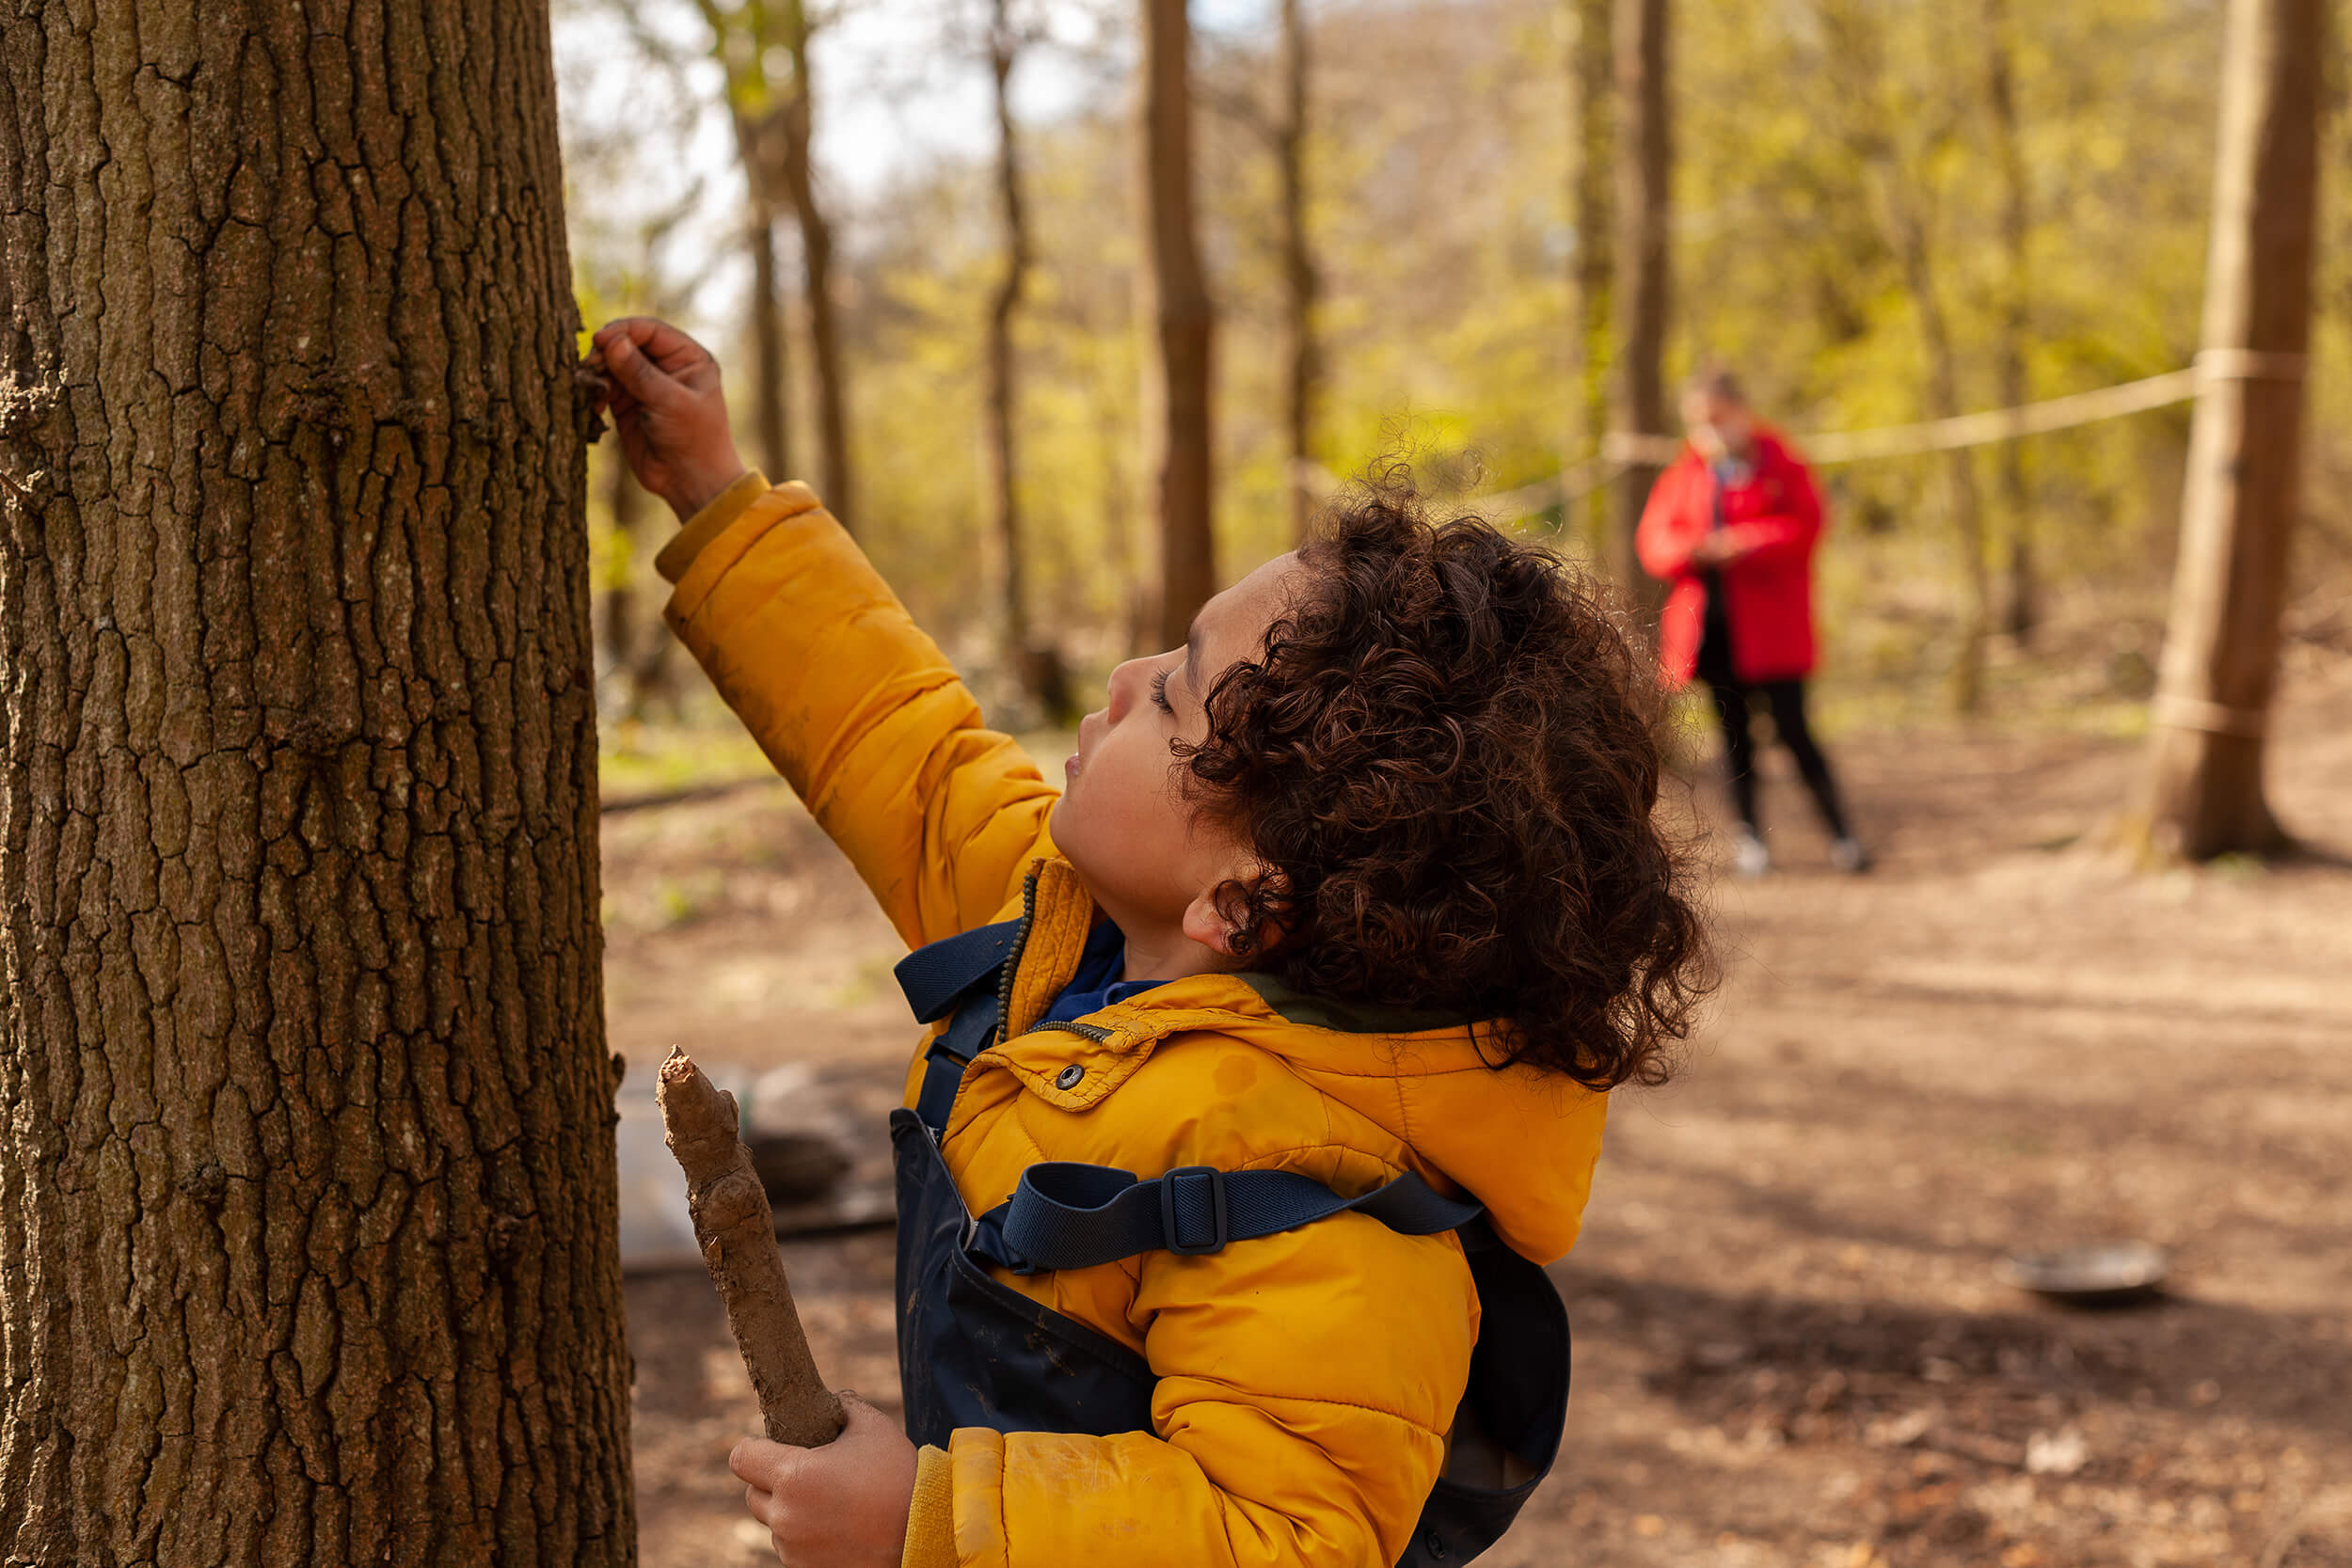 Boy looking at a tree